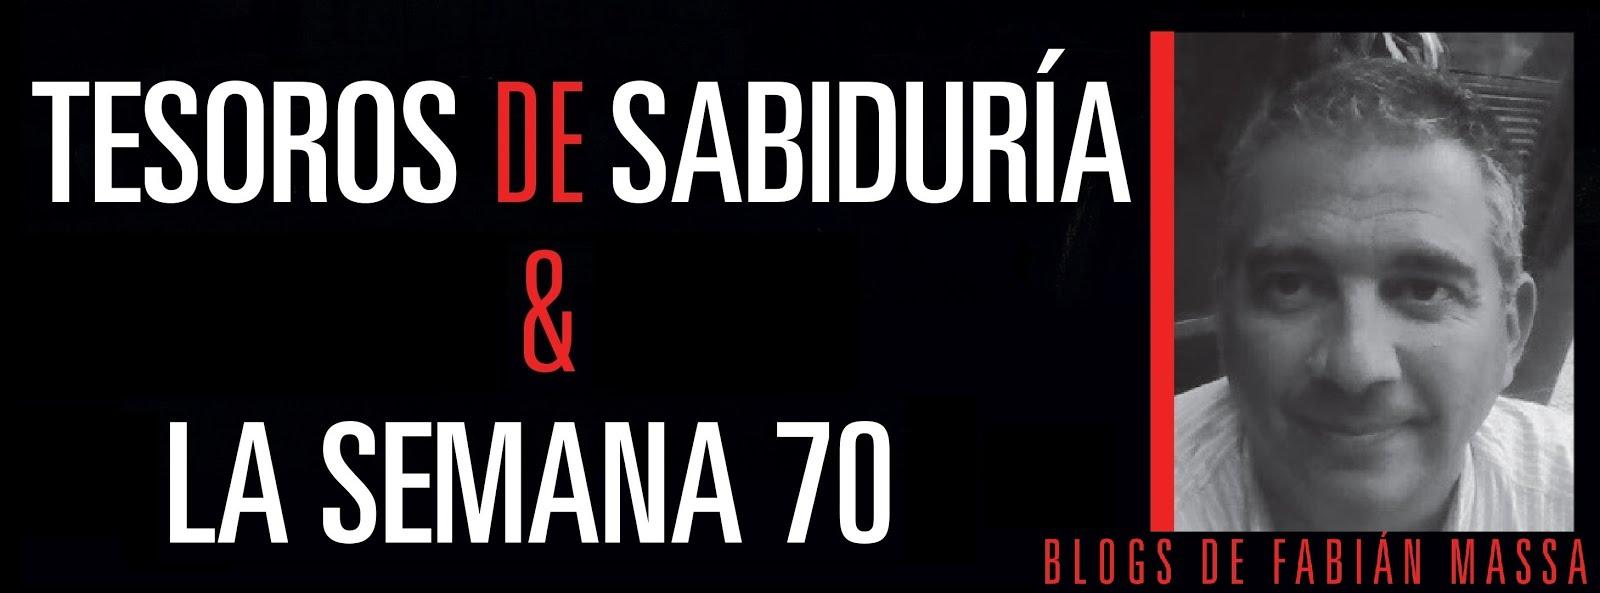 Tesoros de Sabiduría - La Semana 7o - Blogs de Fabian Massa